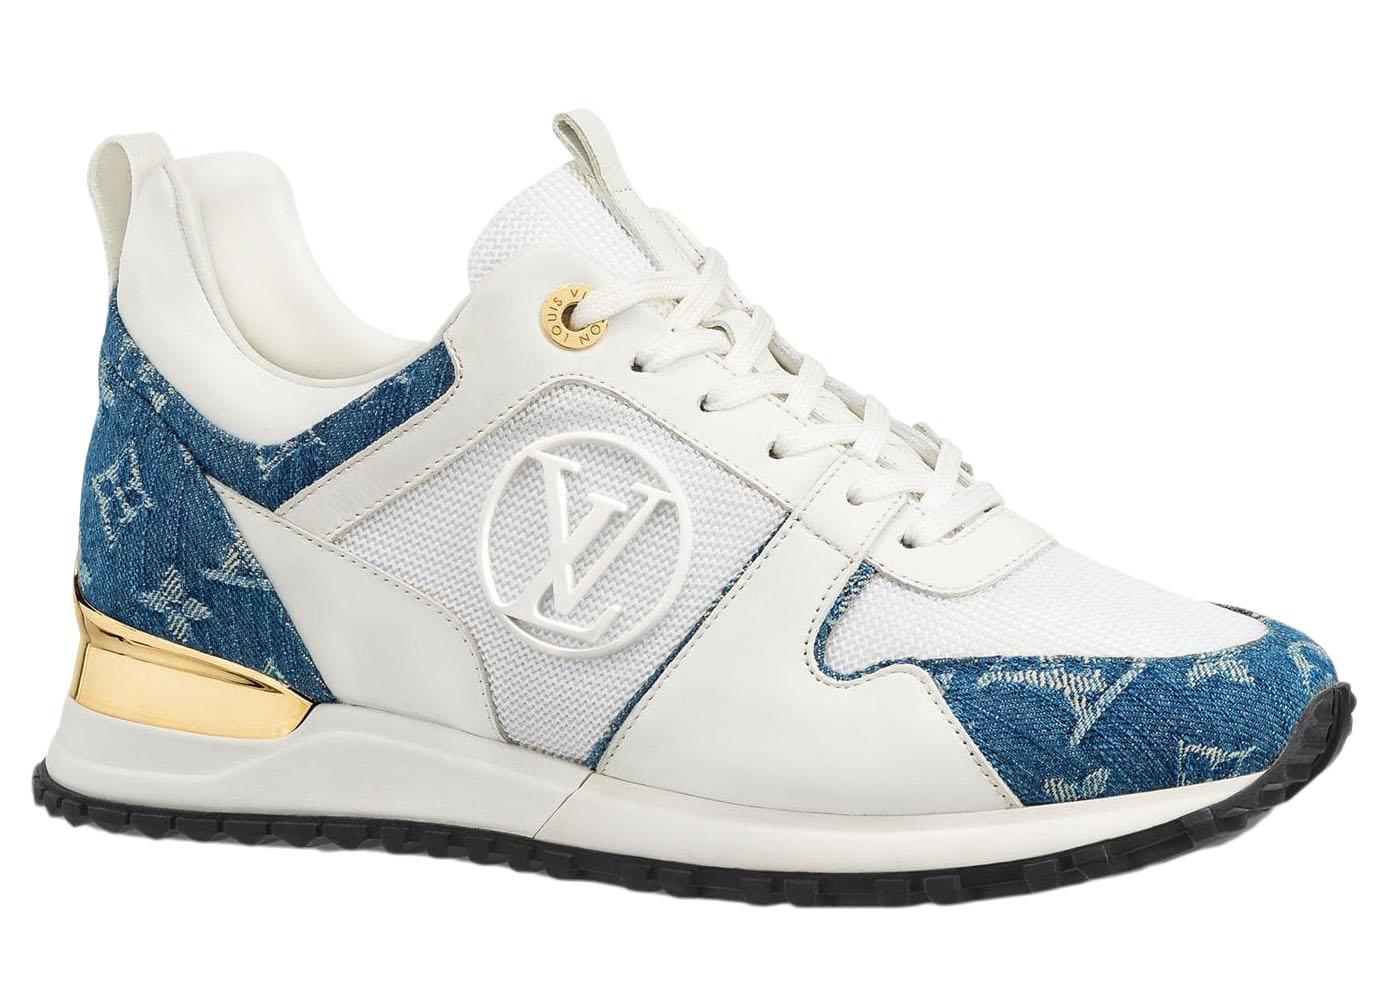 LouisVuitton Run Away Sneaker Monogram